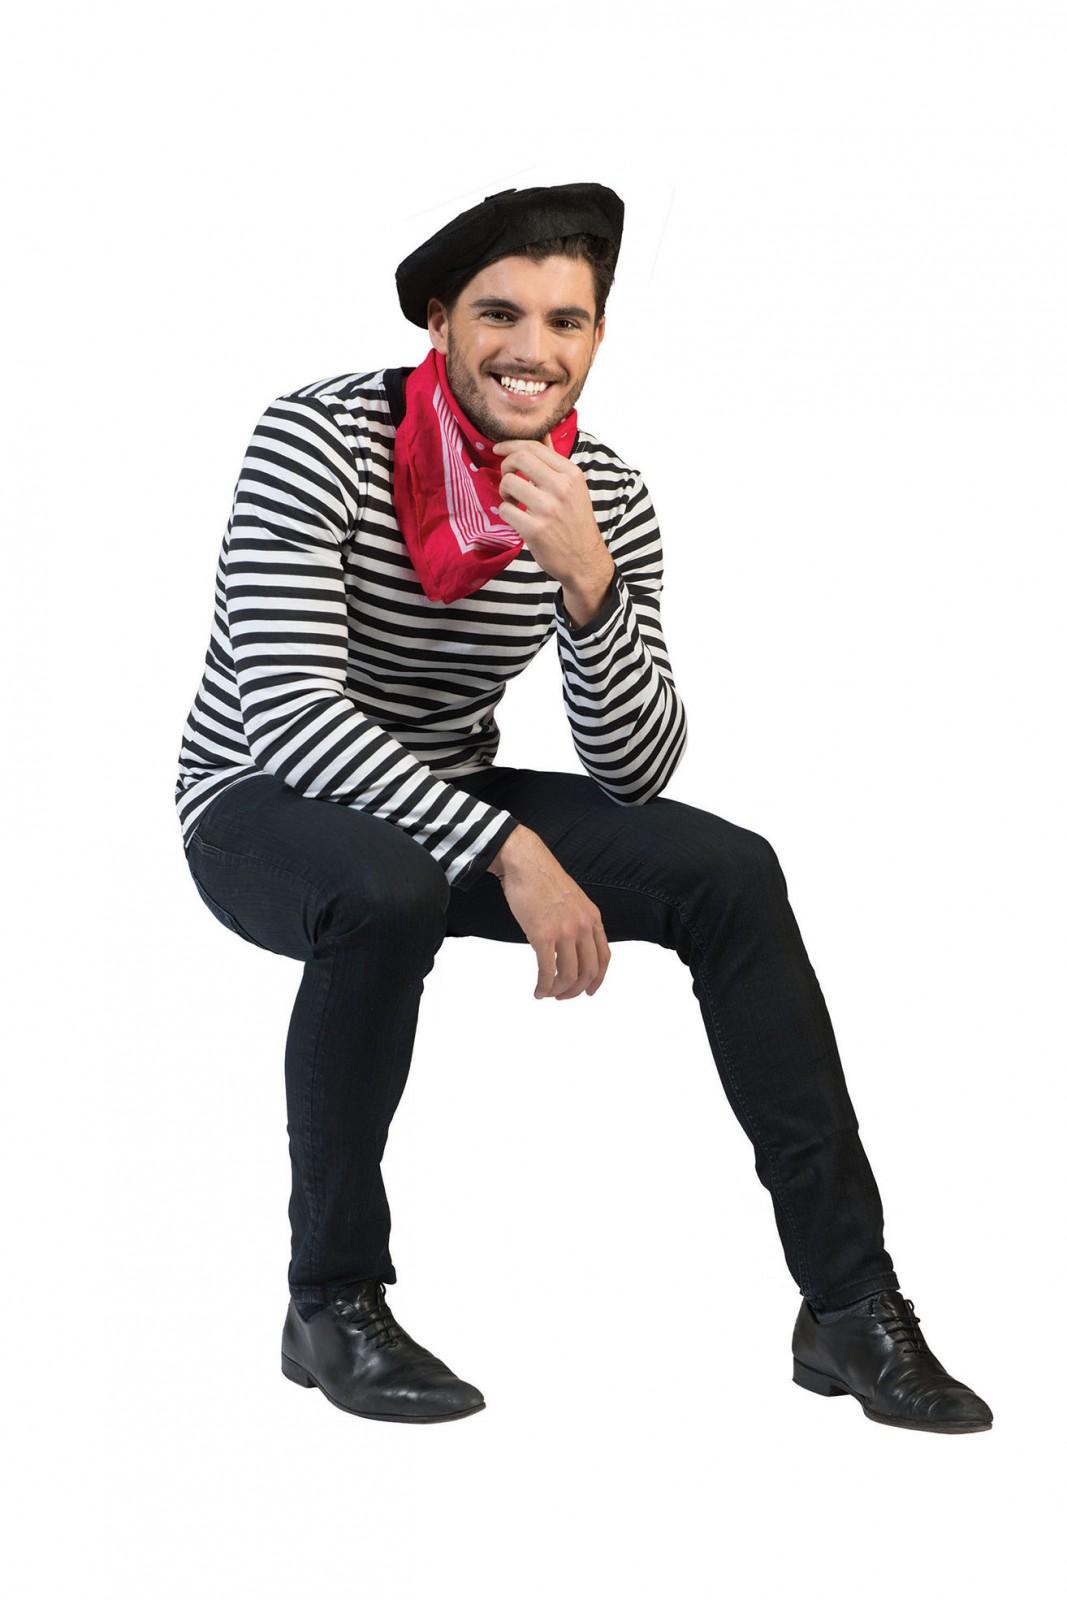 Kostum Ringelshirt Schwarz Weiss Franzose Pantomime Clown Karneval